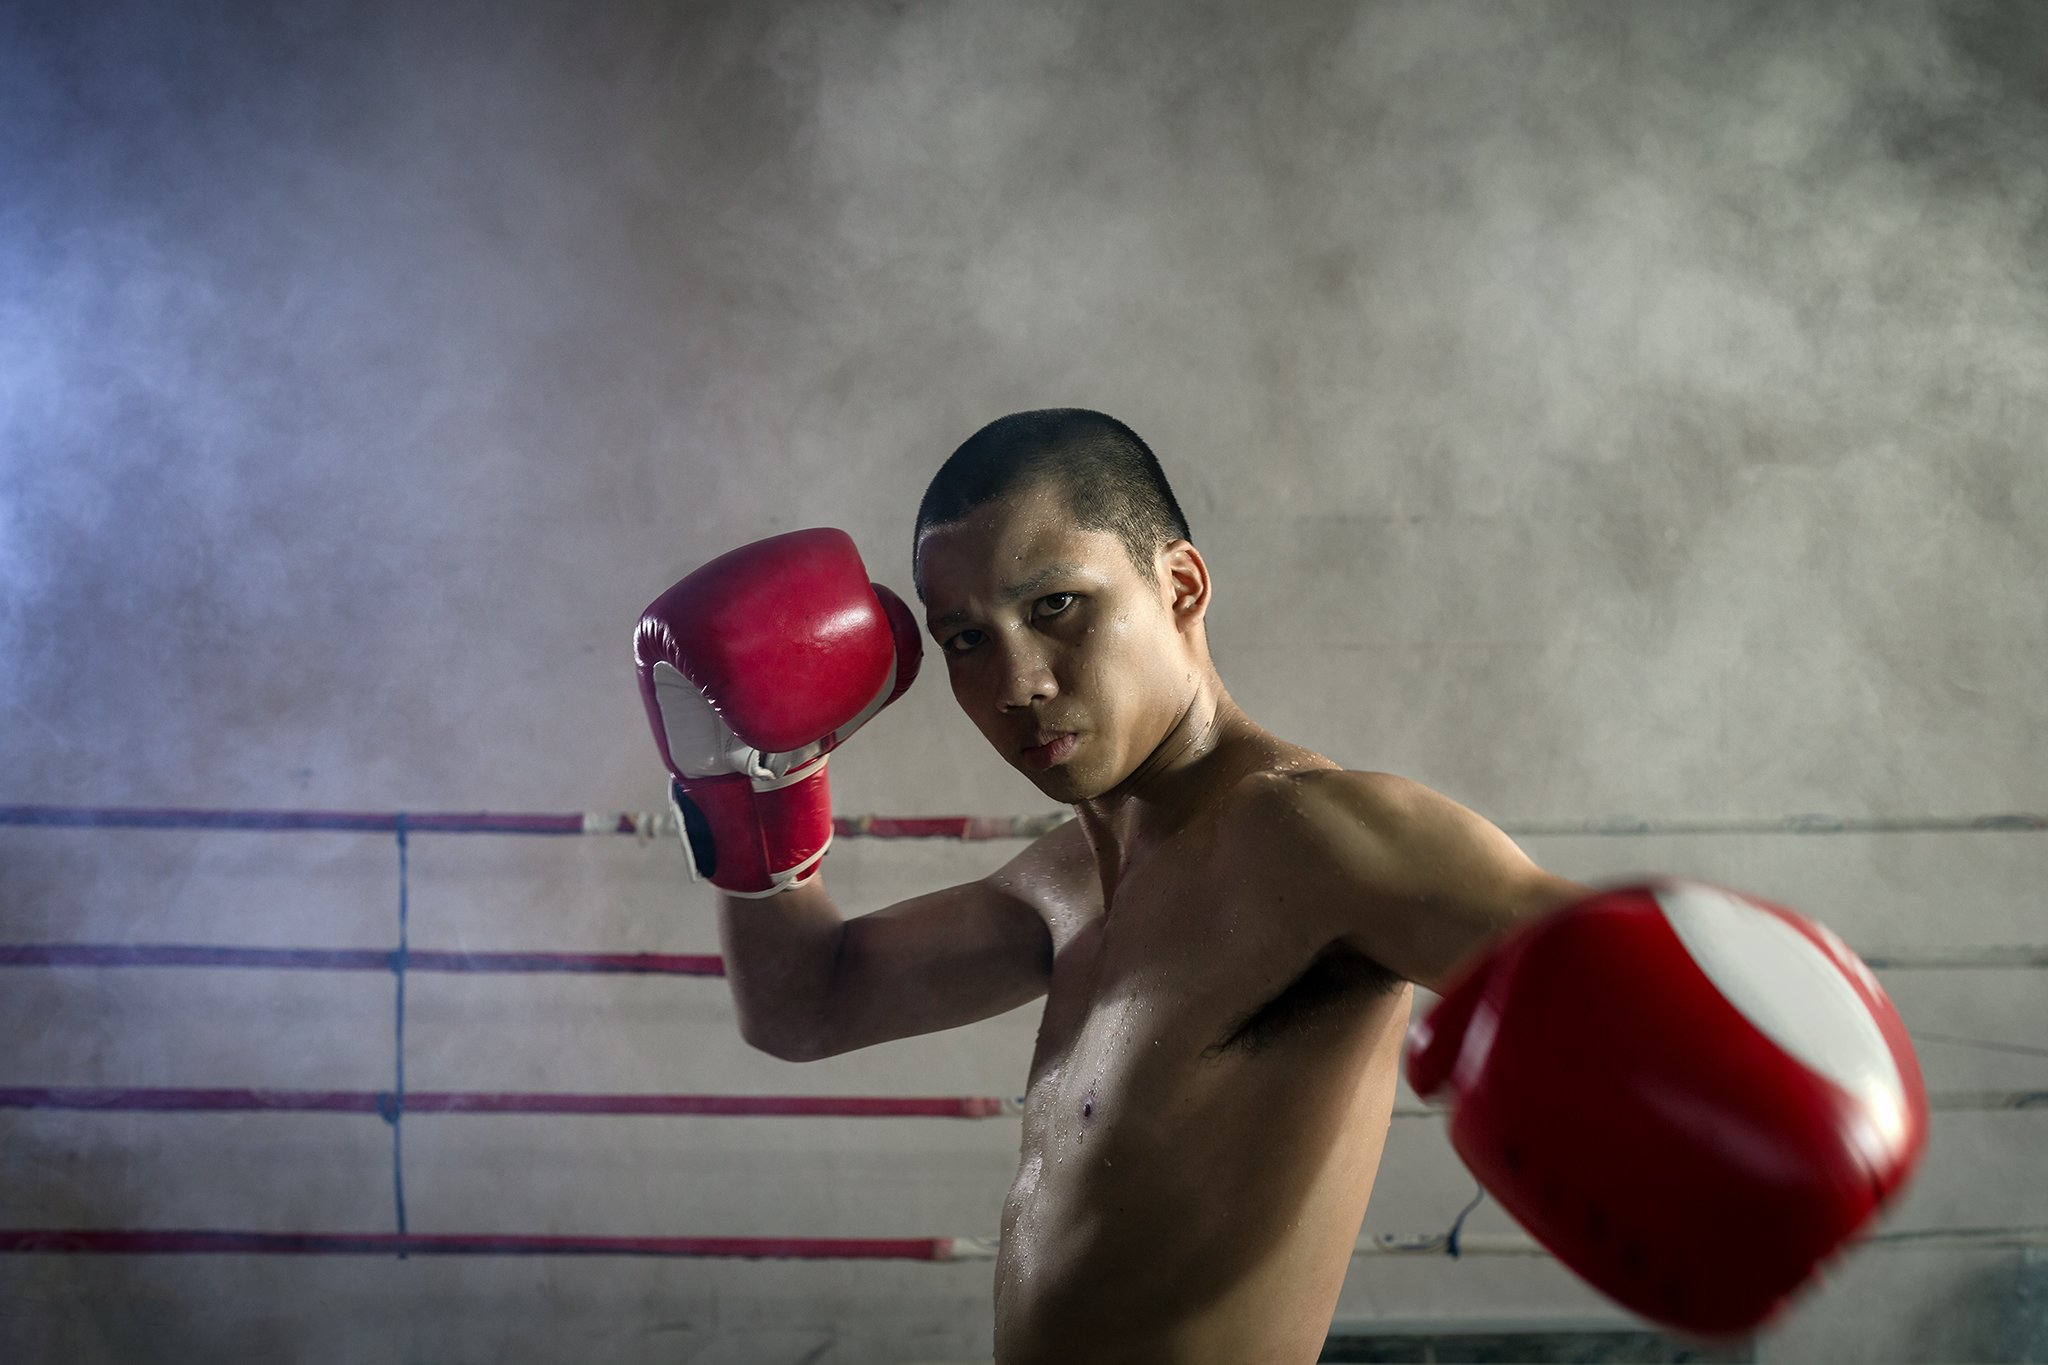 boxer,Boxing,muay,muaythai,Martial art,, SUTIPORN SOMNAM